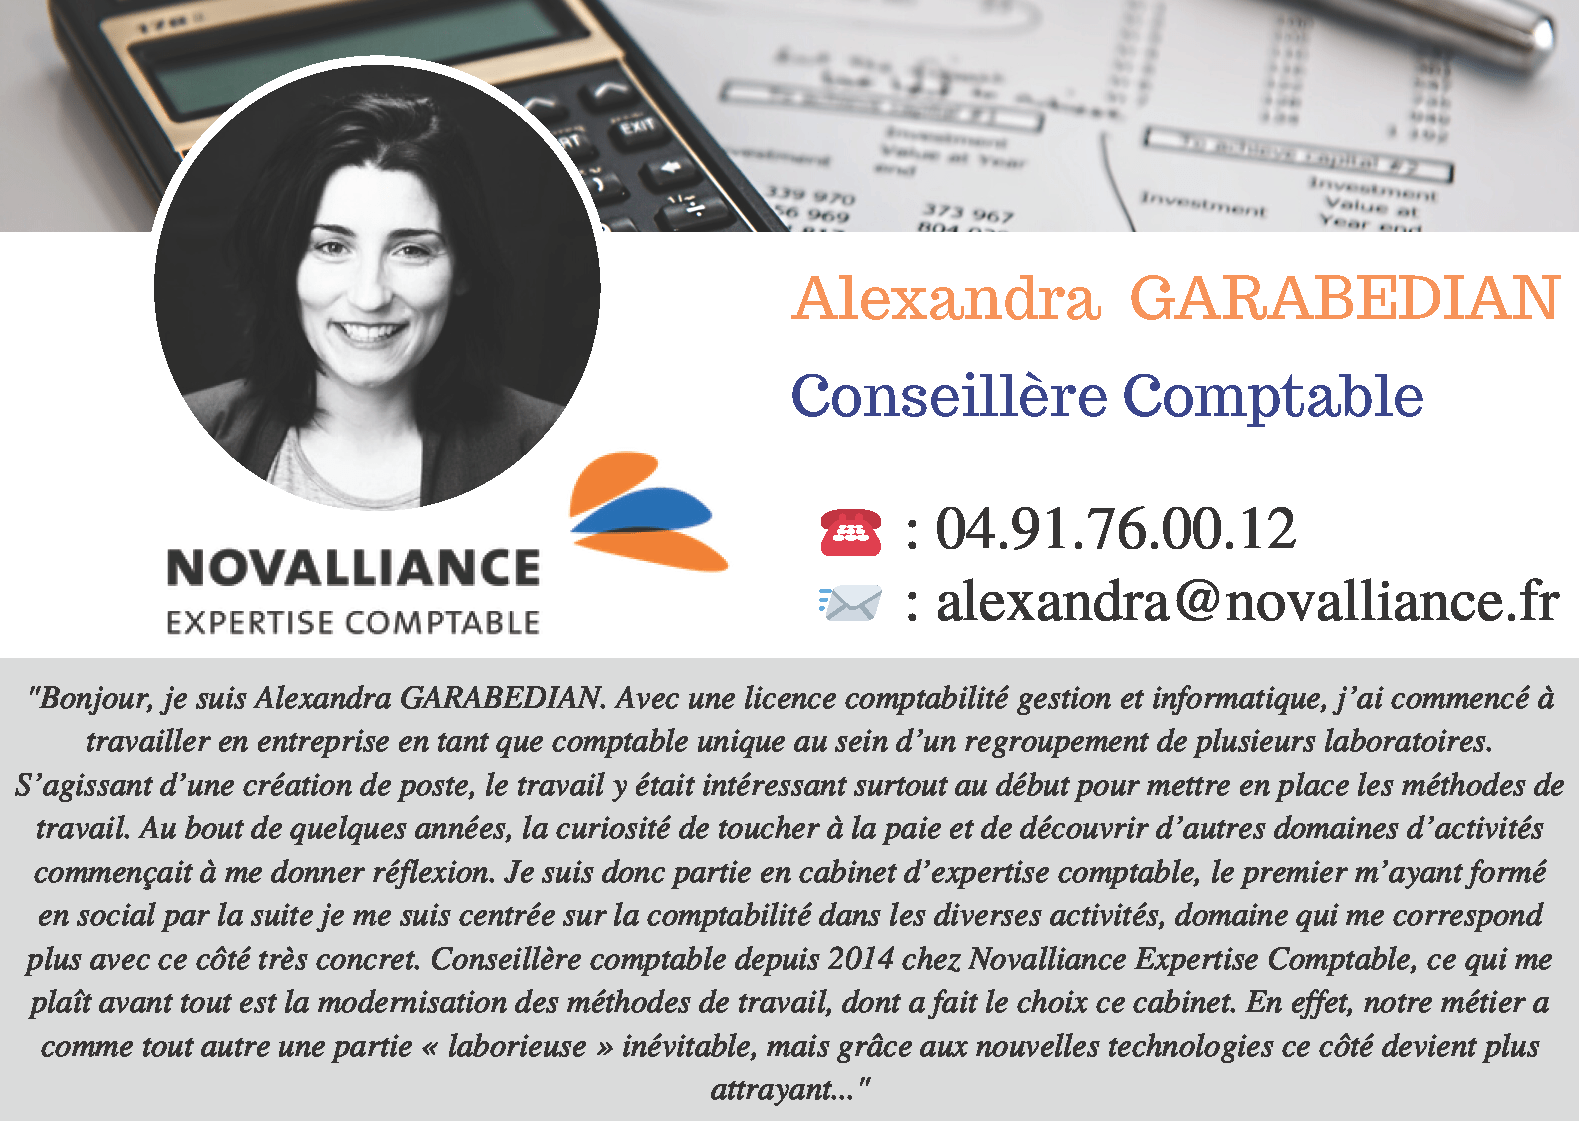 Fiche Conseillère Comptable Alexandra GARABEDIAN